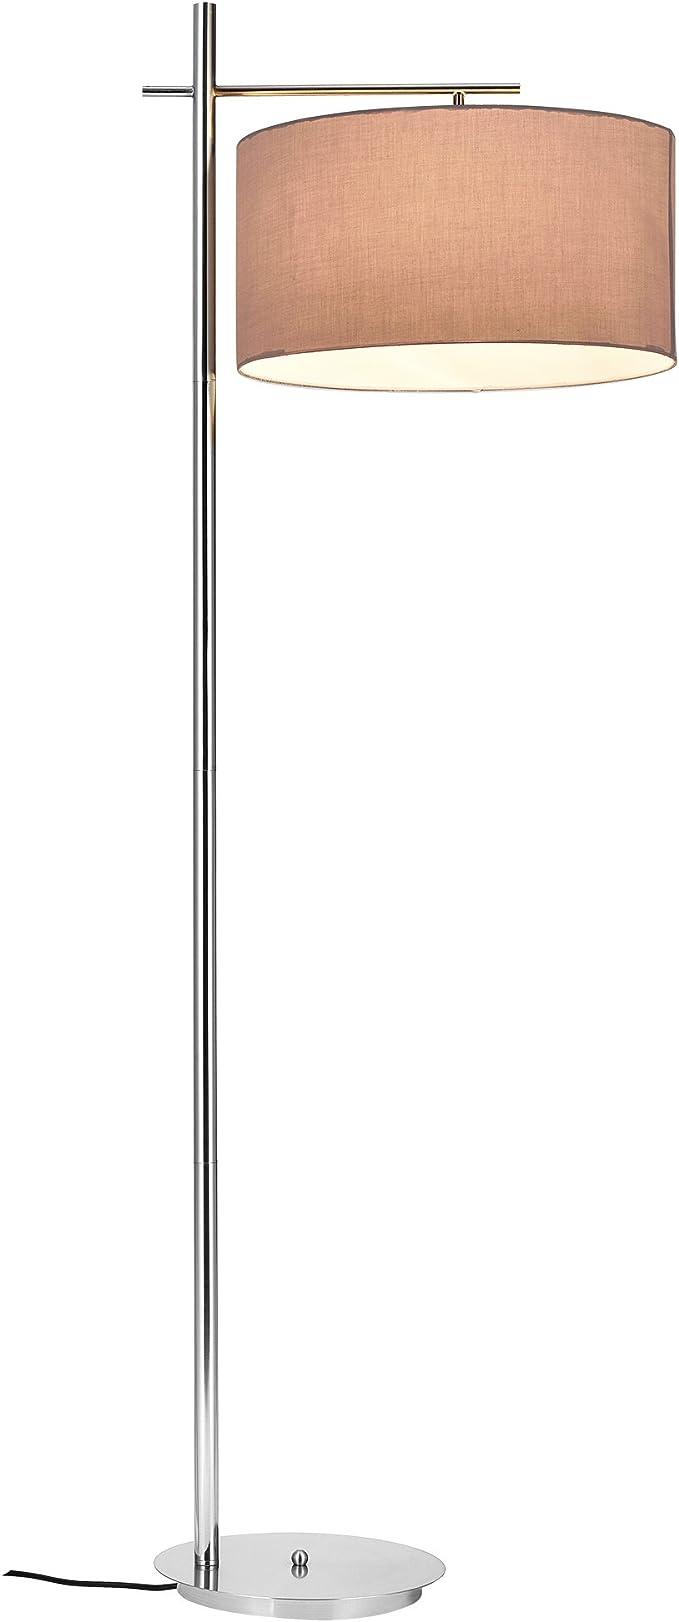 Lux Pro Stehleuchte London 1 X E27 Sockel 155cm X O 46cm